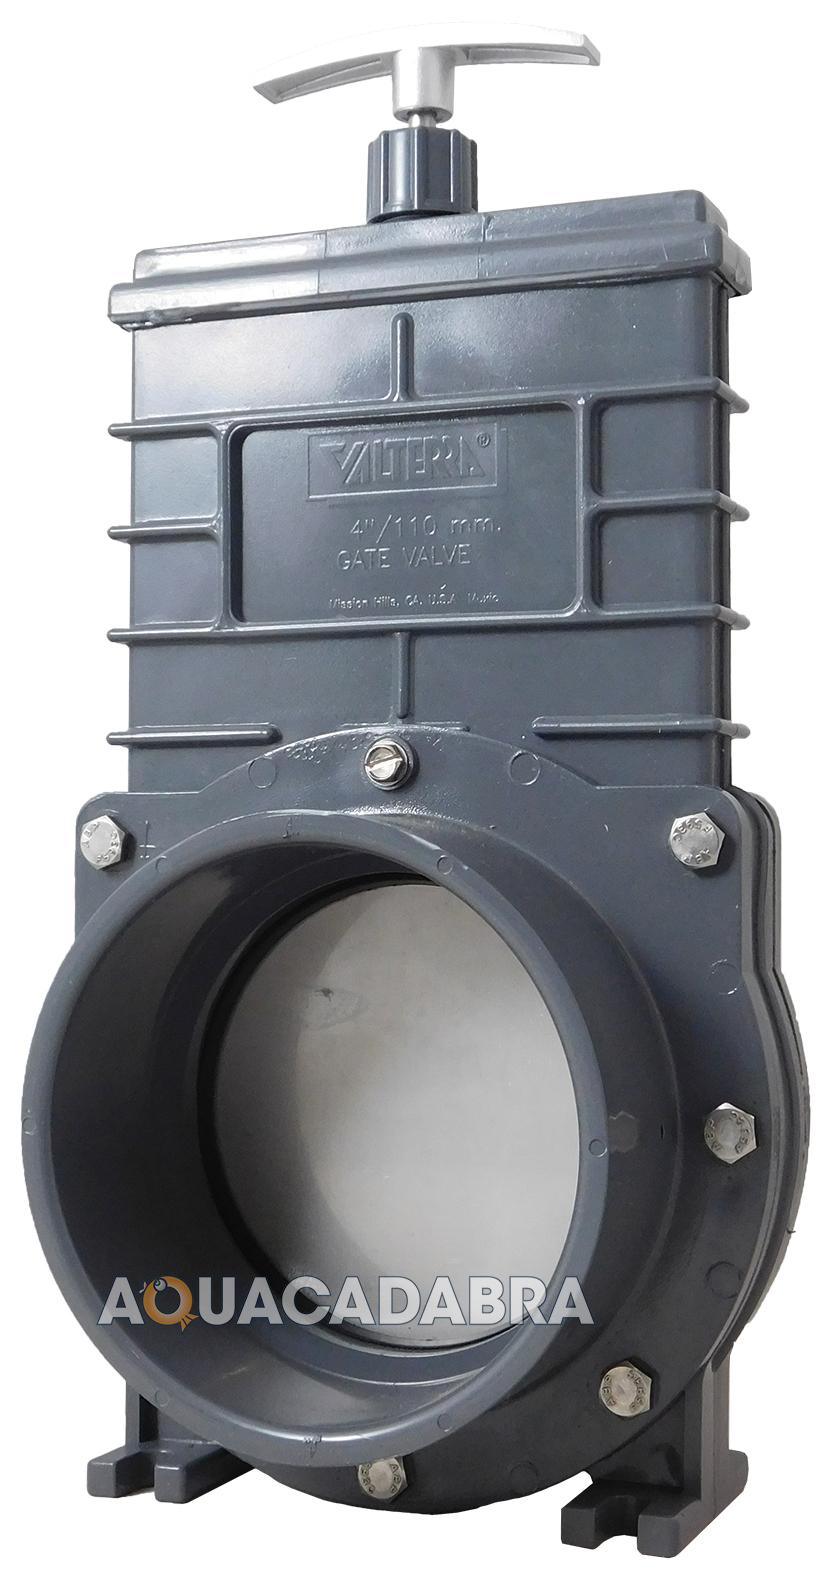 Valterra slide gate 110mm 4 valve genuine pond pool for Used koi filters